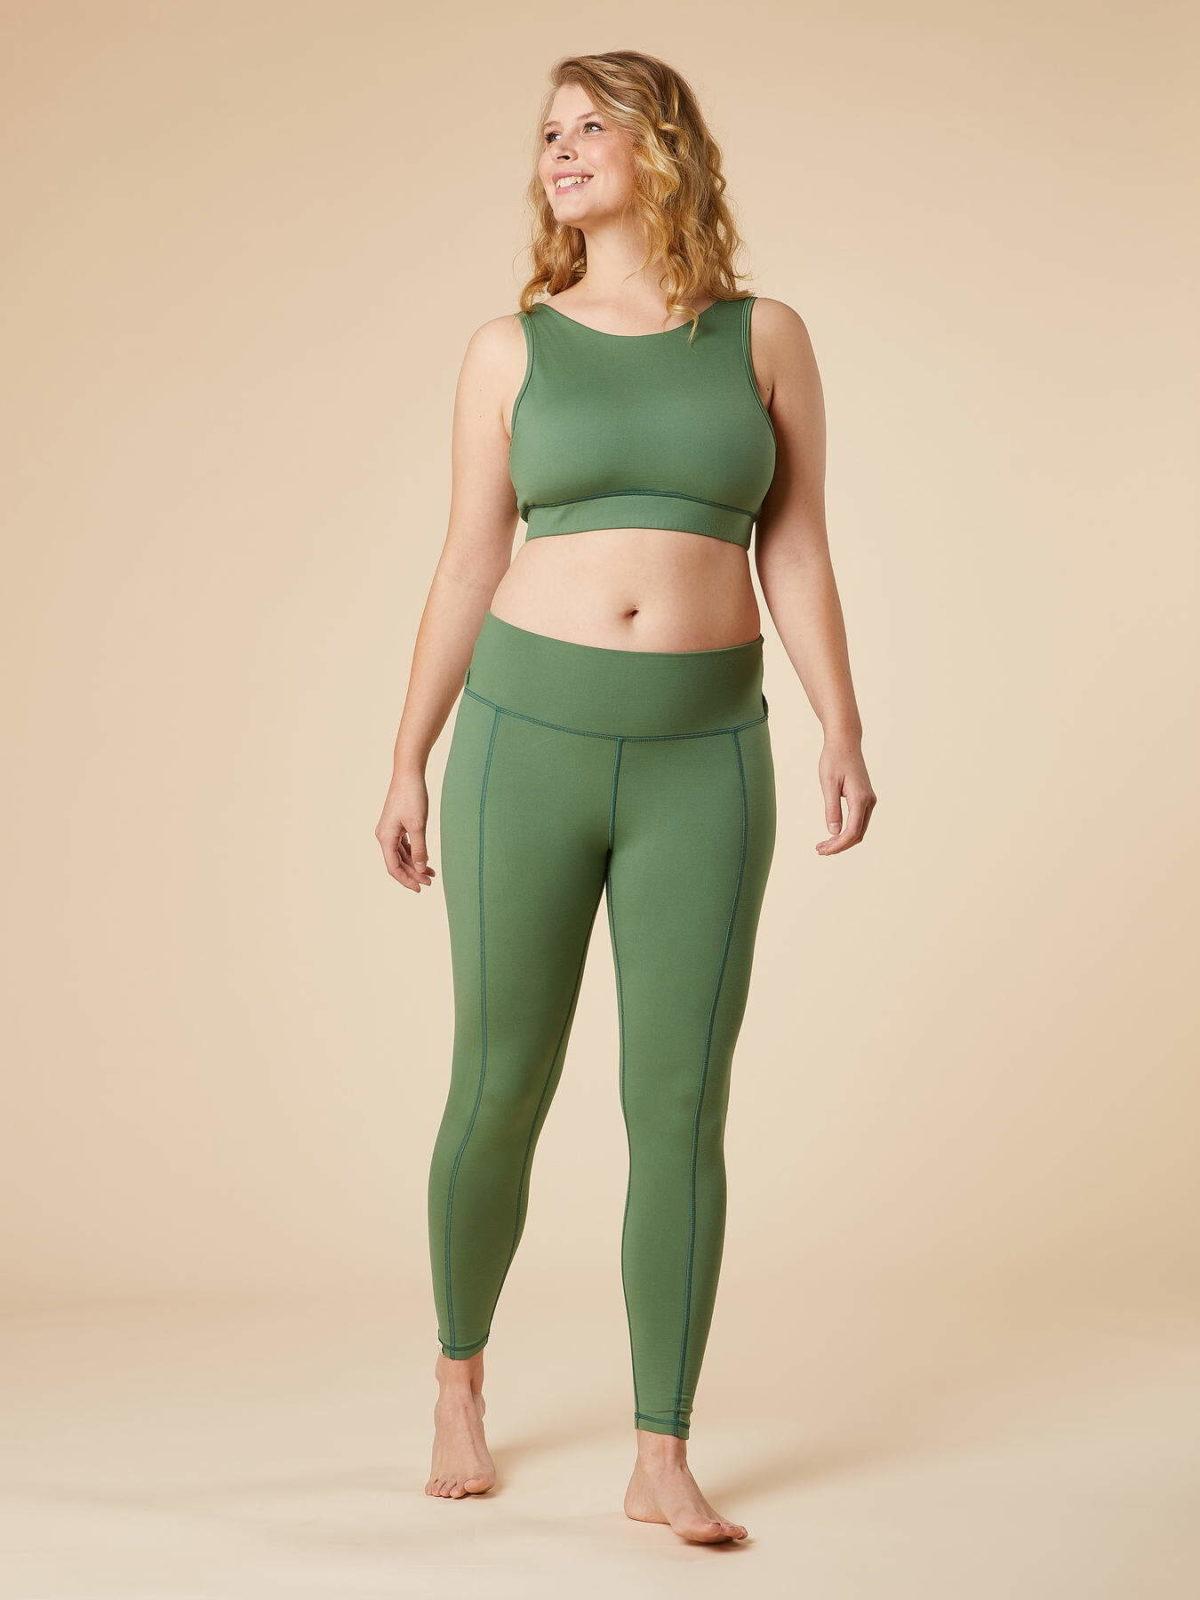 chakrana yoga Leggings Shakti Schilf Outfit Frontansicht